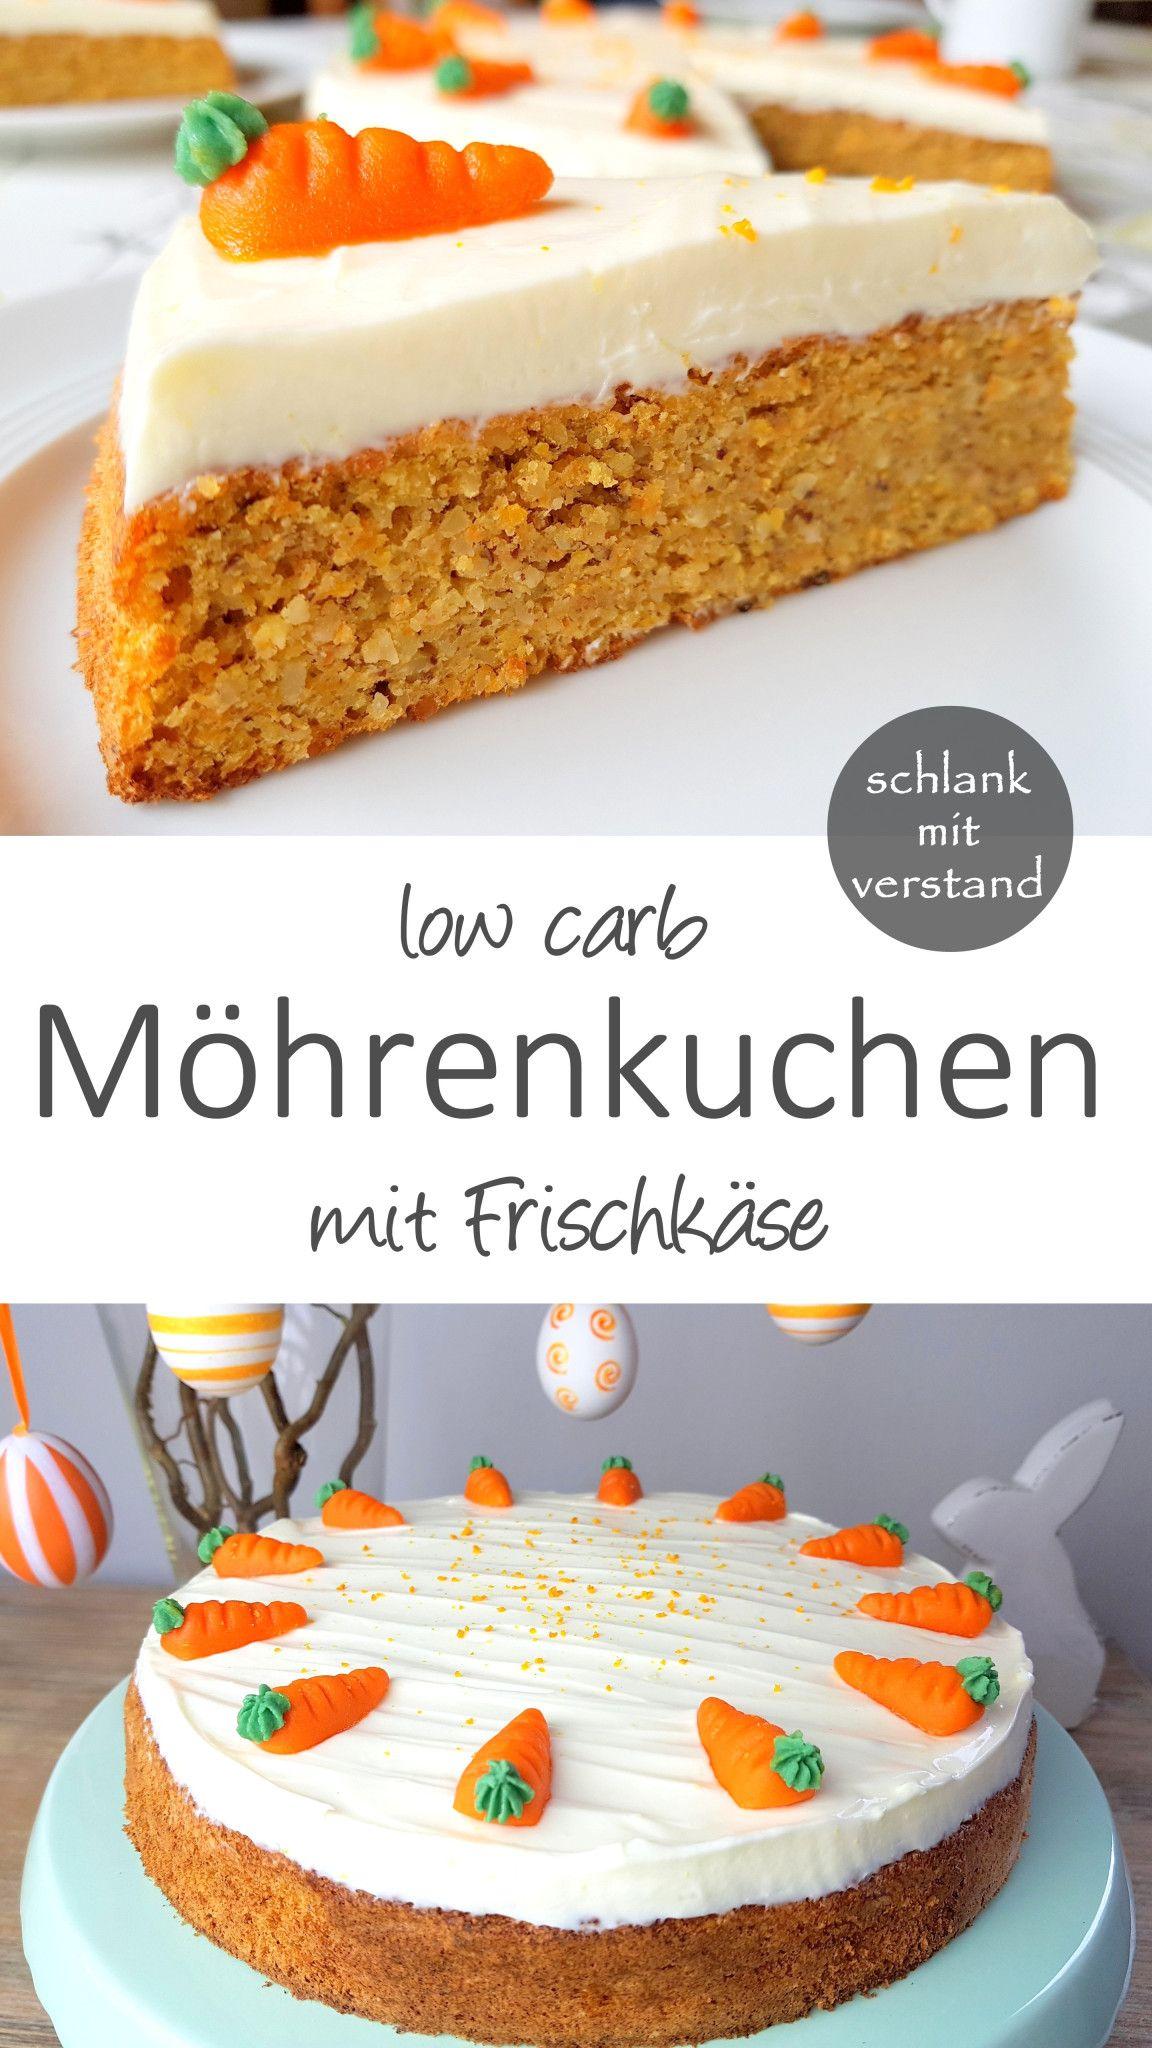 low carb Möhrenkuchen